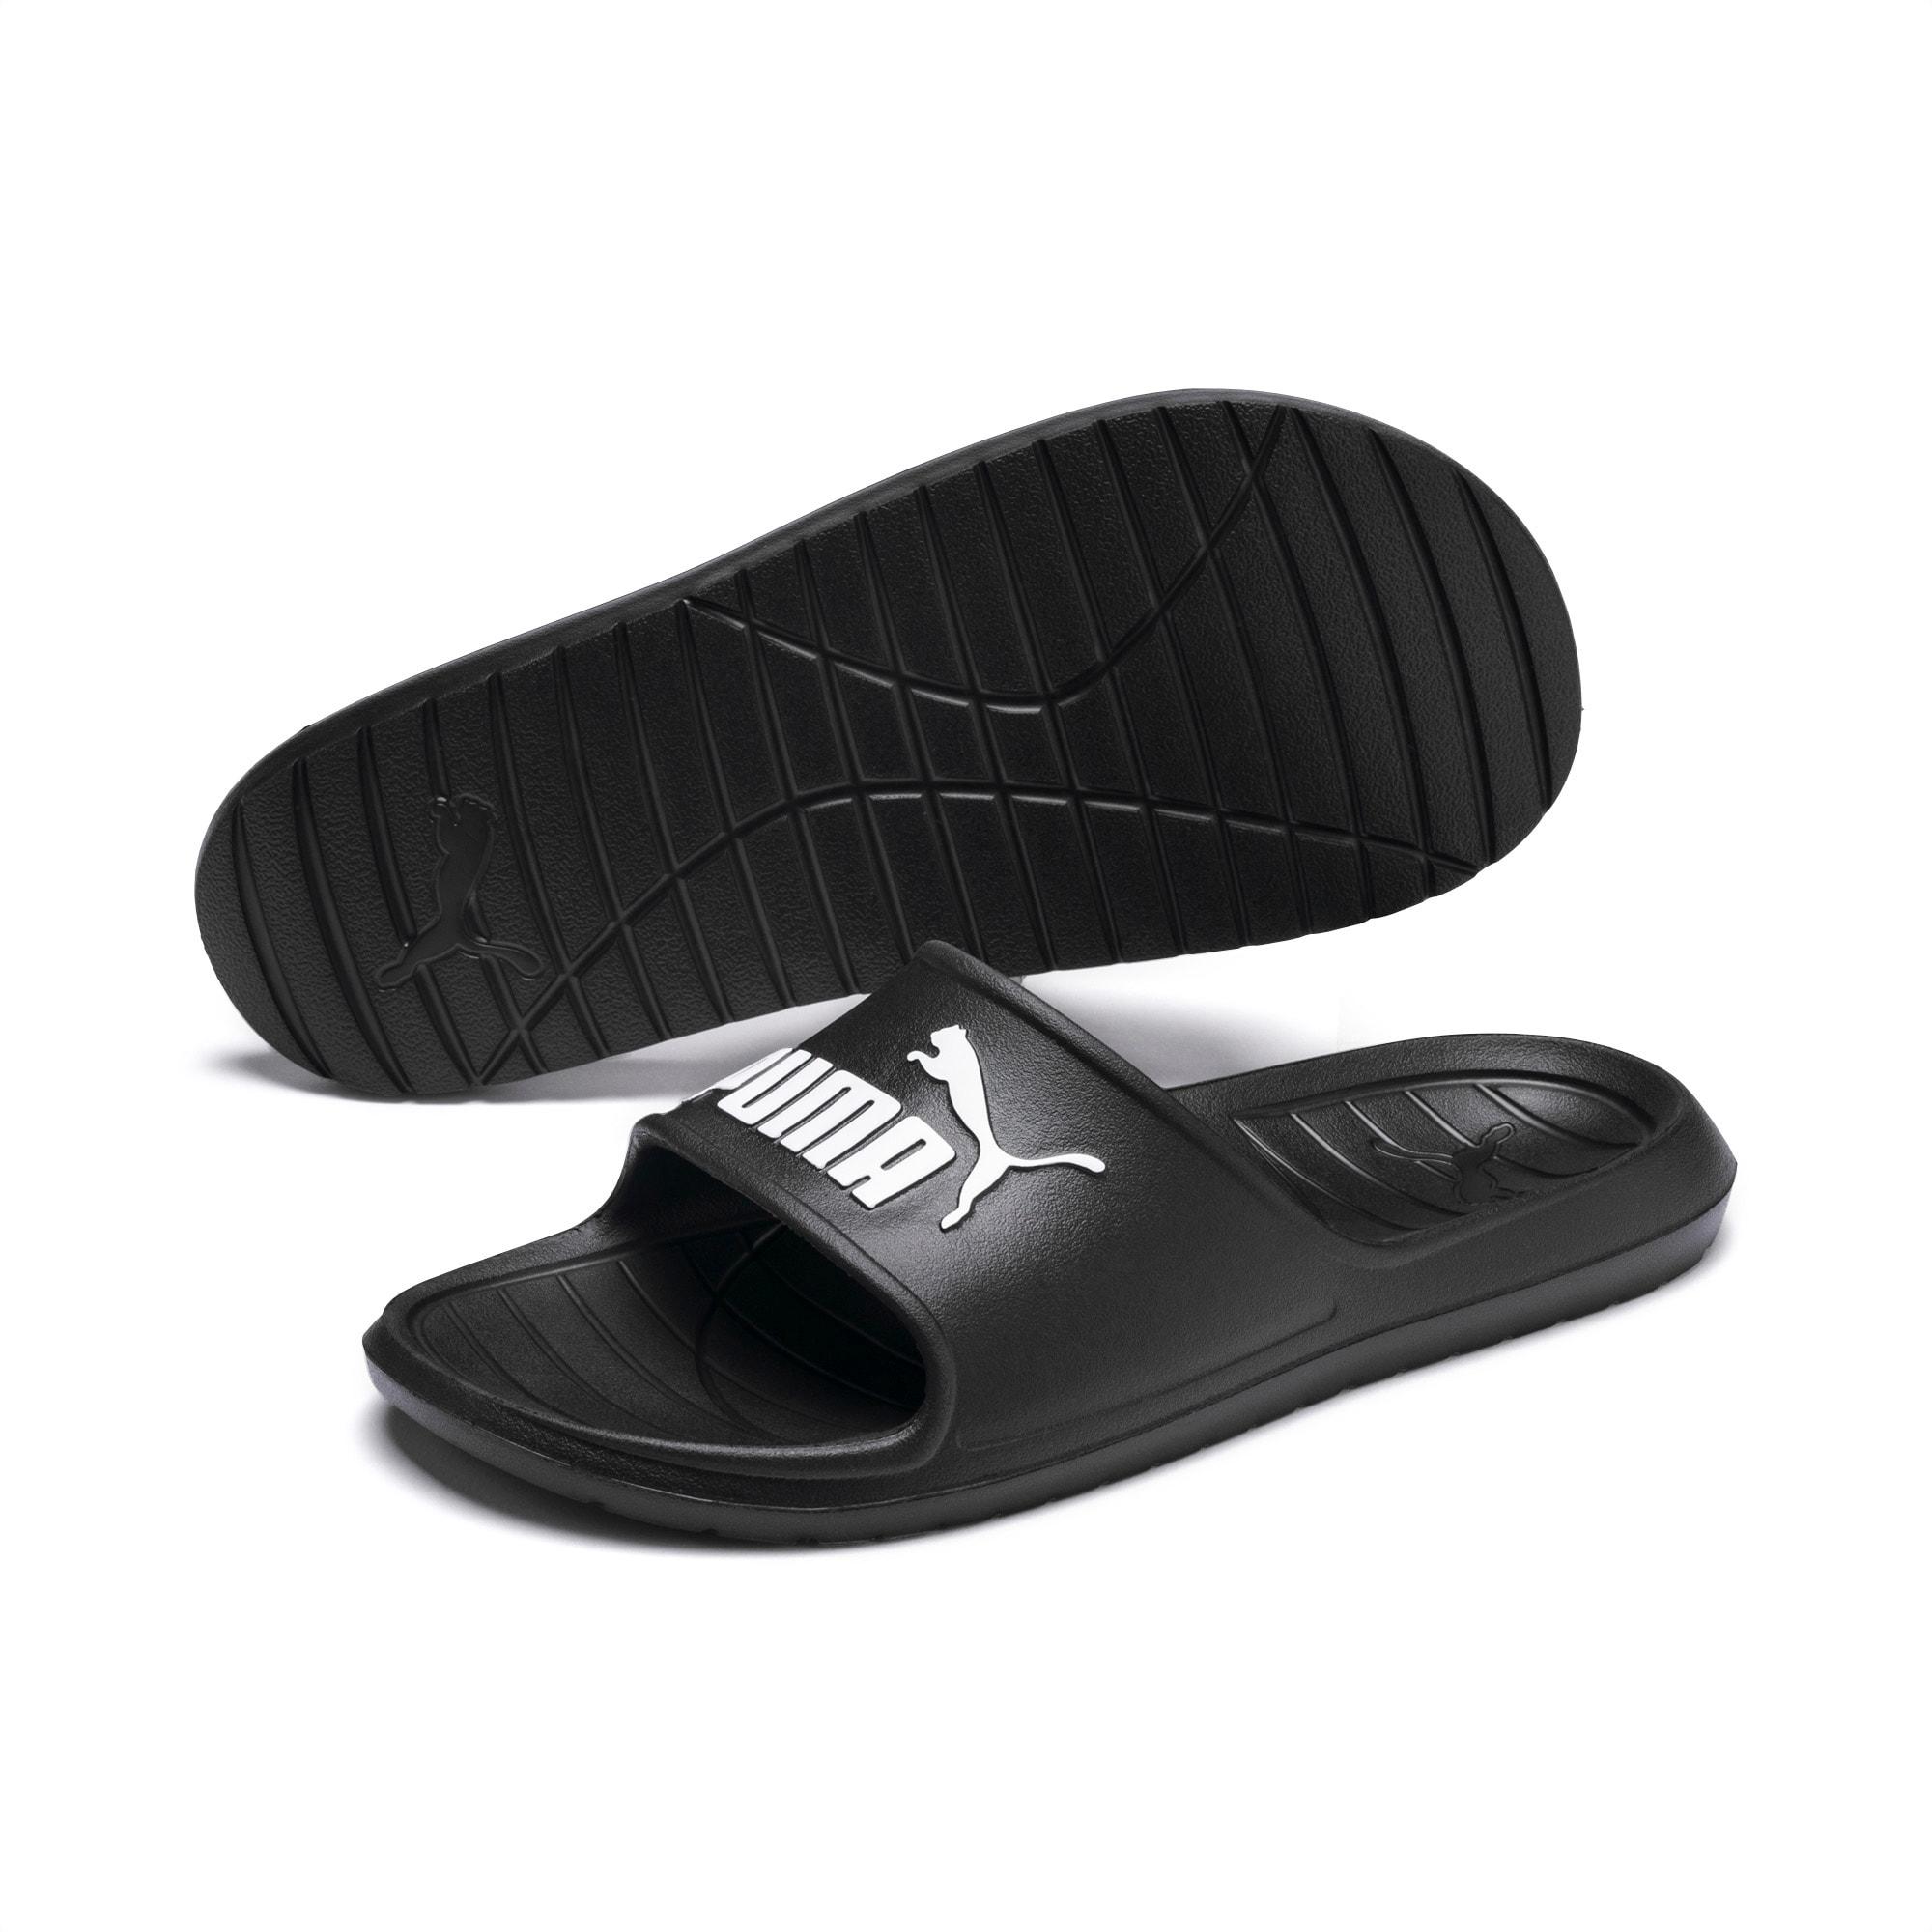 Divecat v2 Slides, Puma Black-Puma White, extralarge